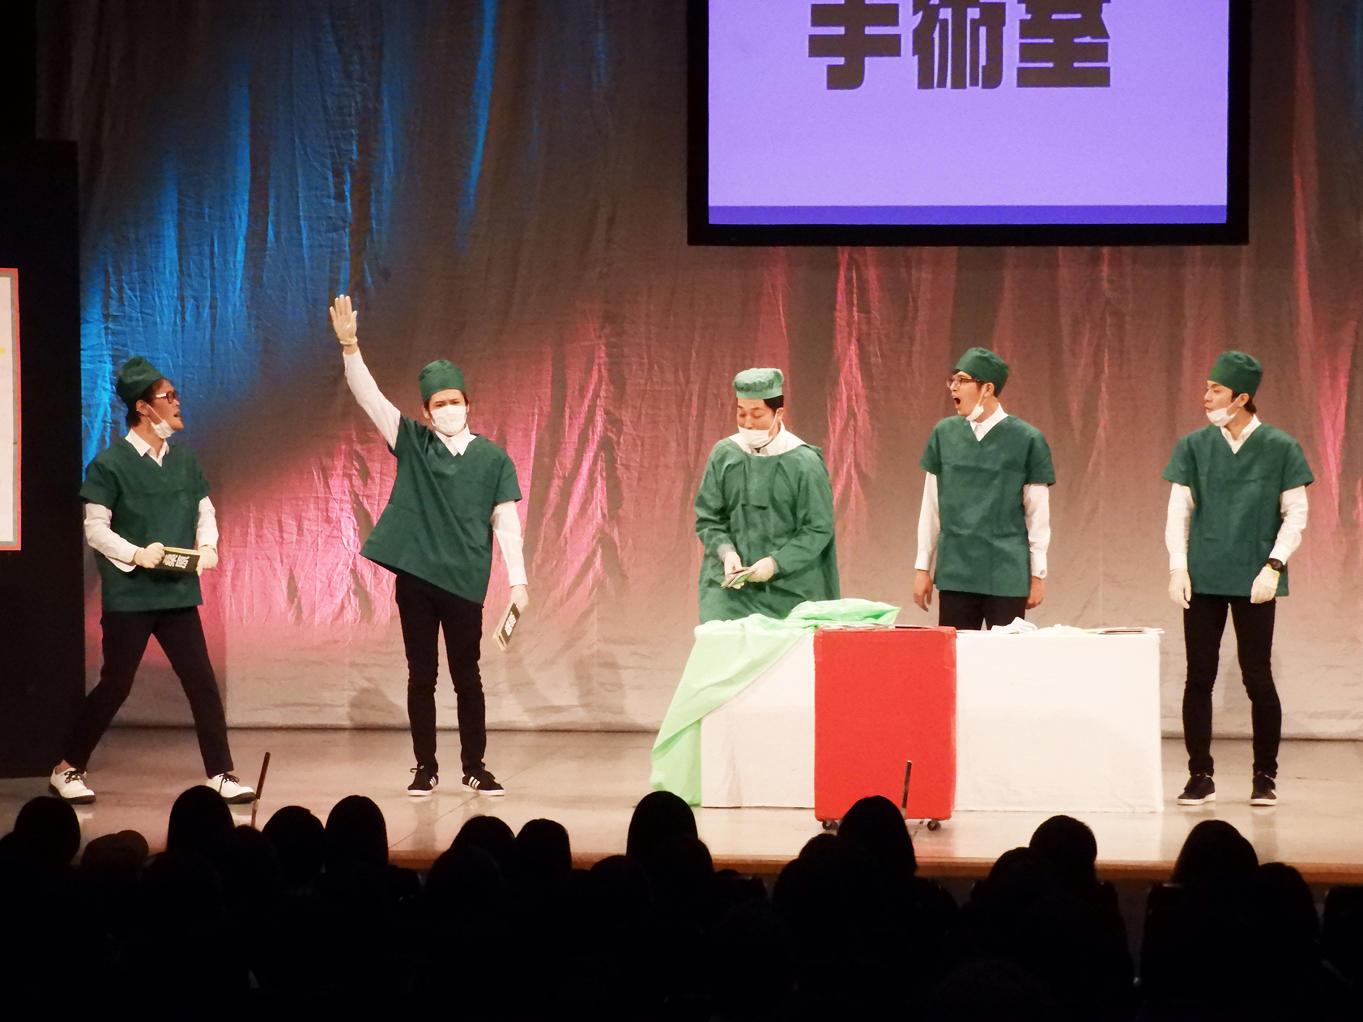 http://news.yoshimoto.co.jp/20180312104053-f2e6b7f147e6e0aa2fc4d6dd466e454b81bebaa9.jpg